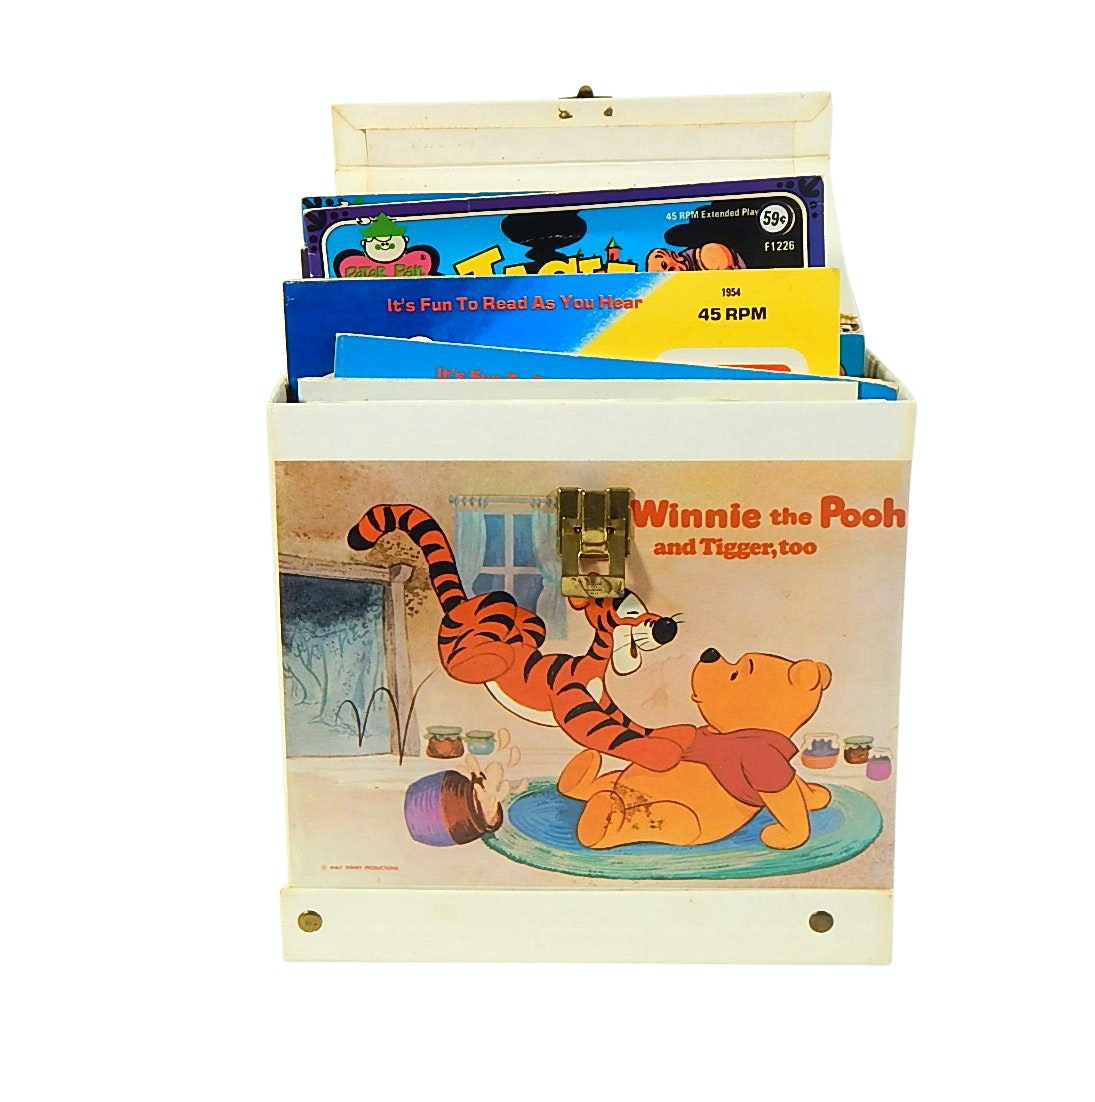 Winnie the Pooh Vinyl Covered Story Book and Album Storage Box ...  sc 1 st  EBTH.com & Winnie the Pooh Vinyl Covered Story Book and Album Storage Box : EBTH